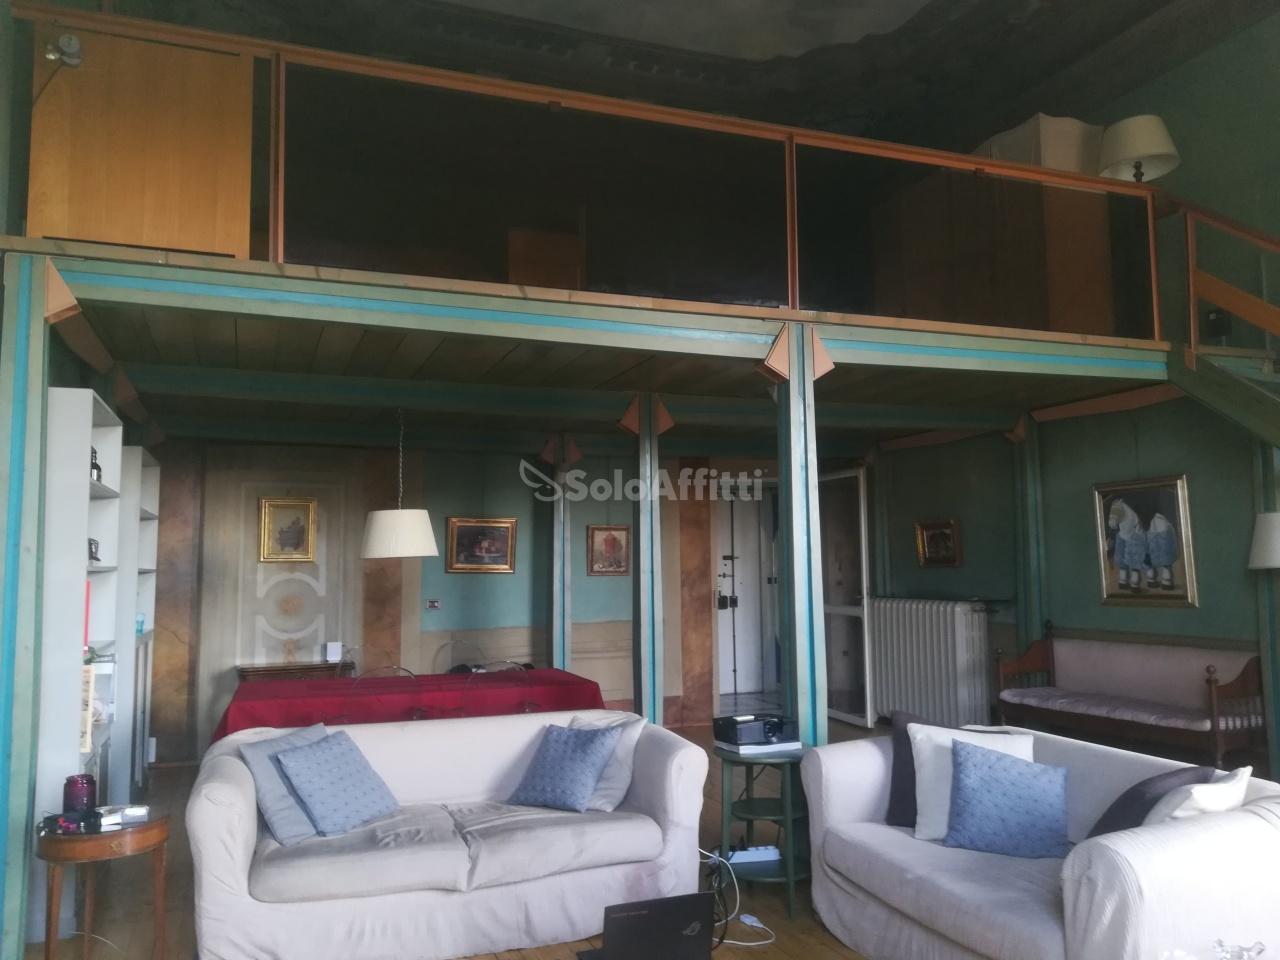 Appartamento - Loft a Centro Storico, Firenze